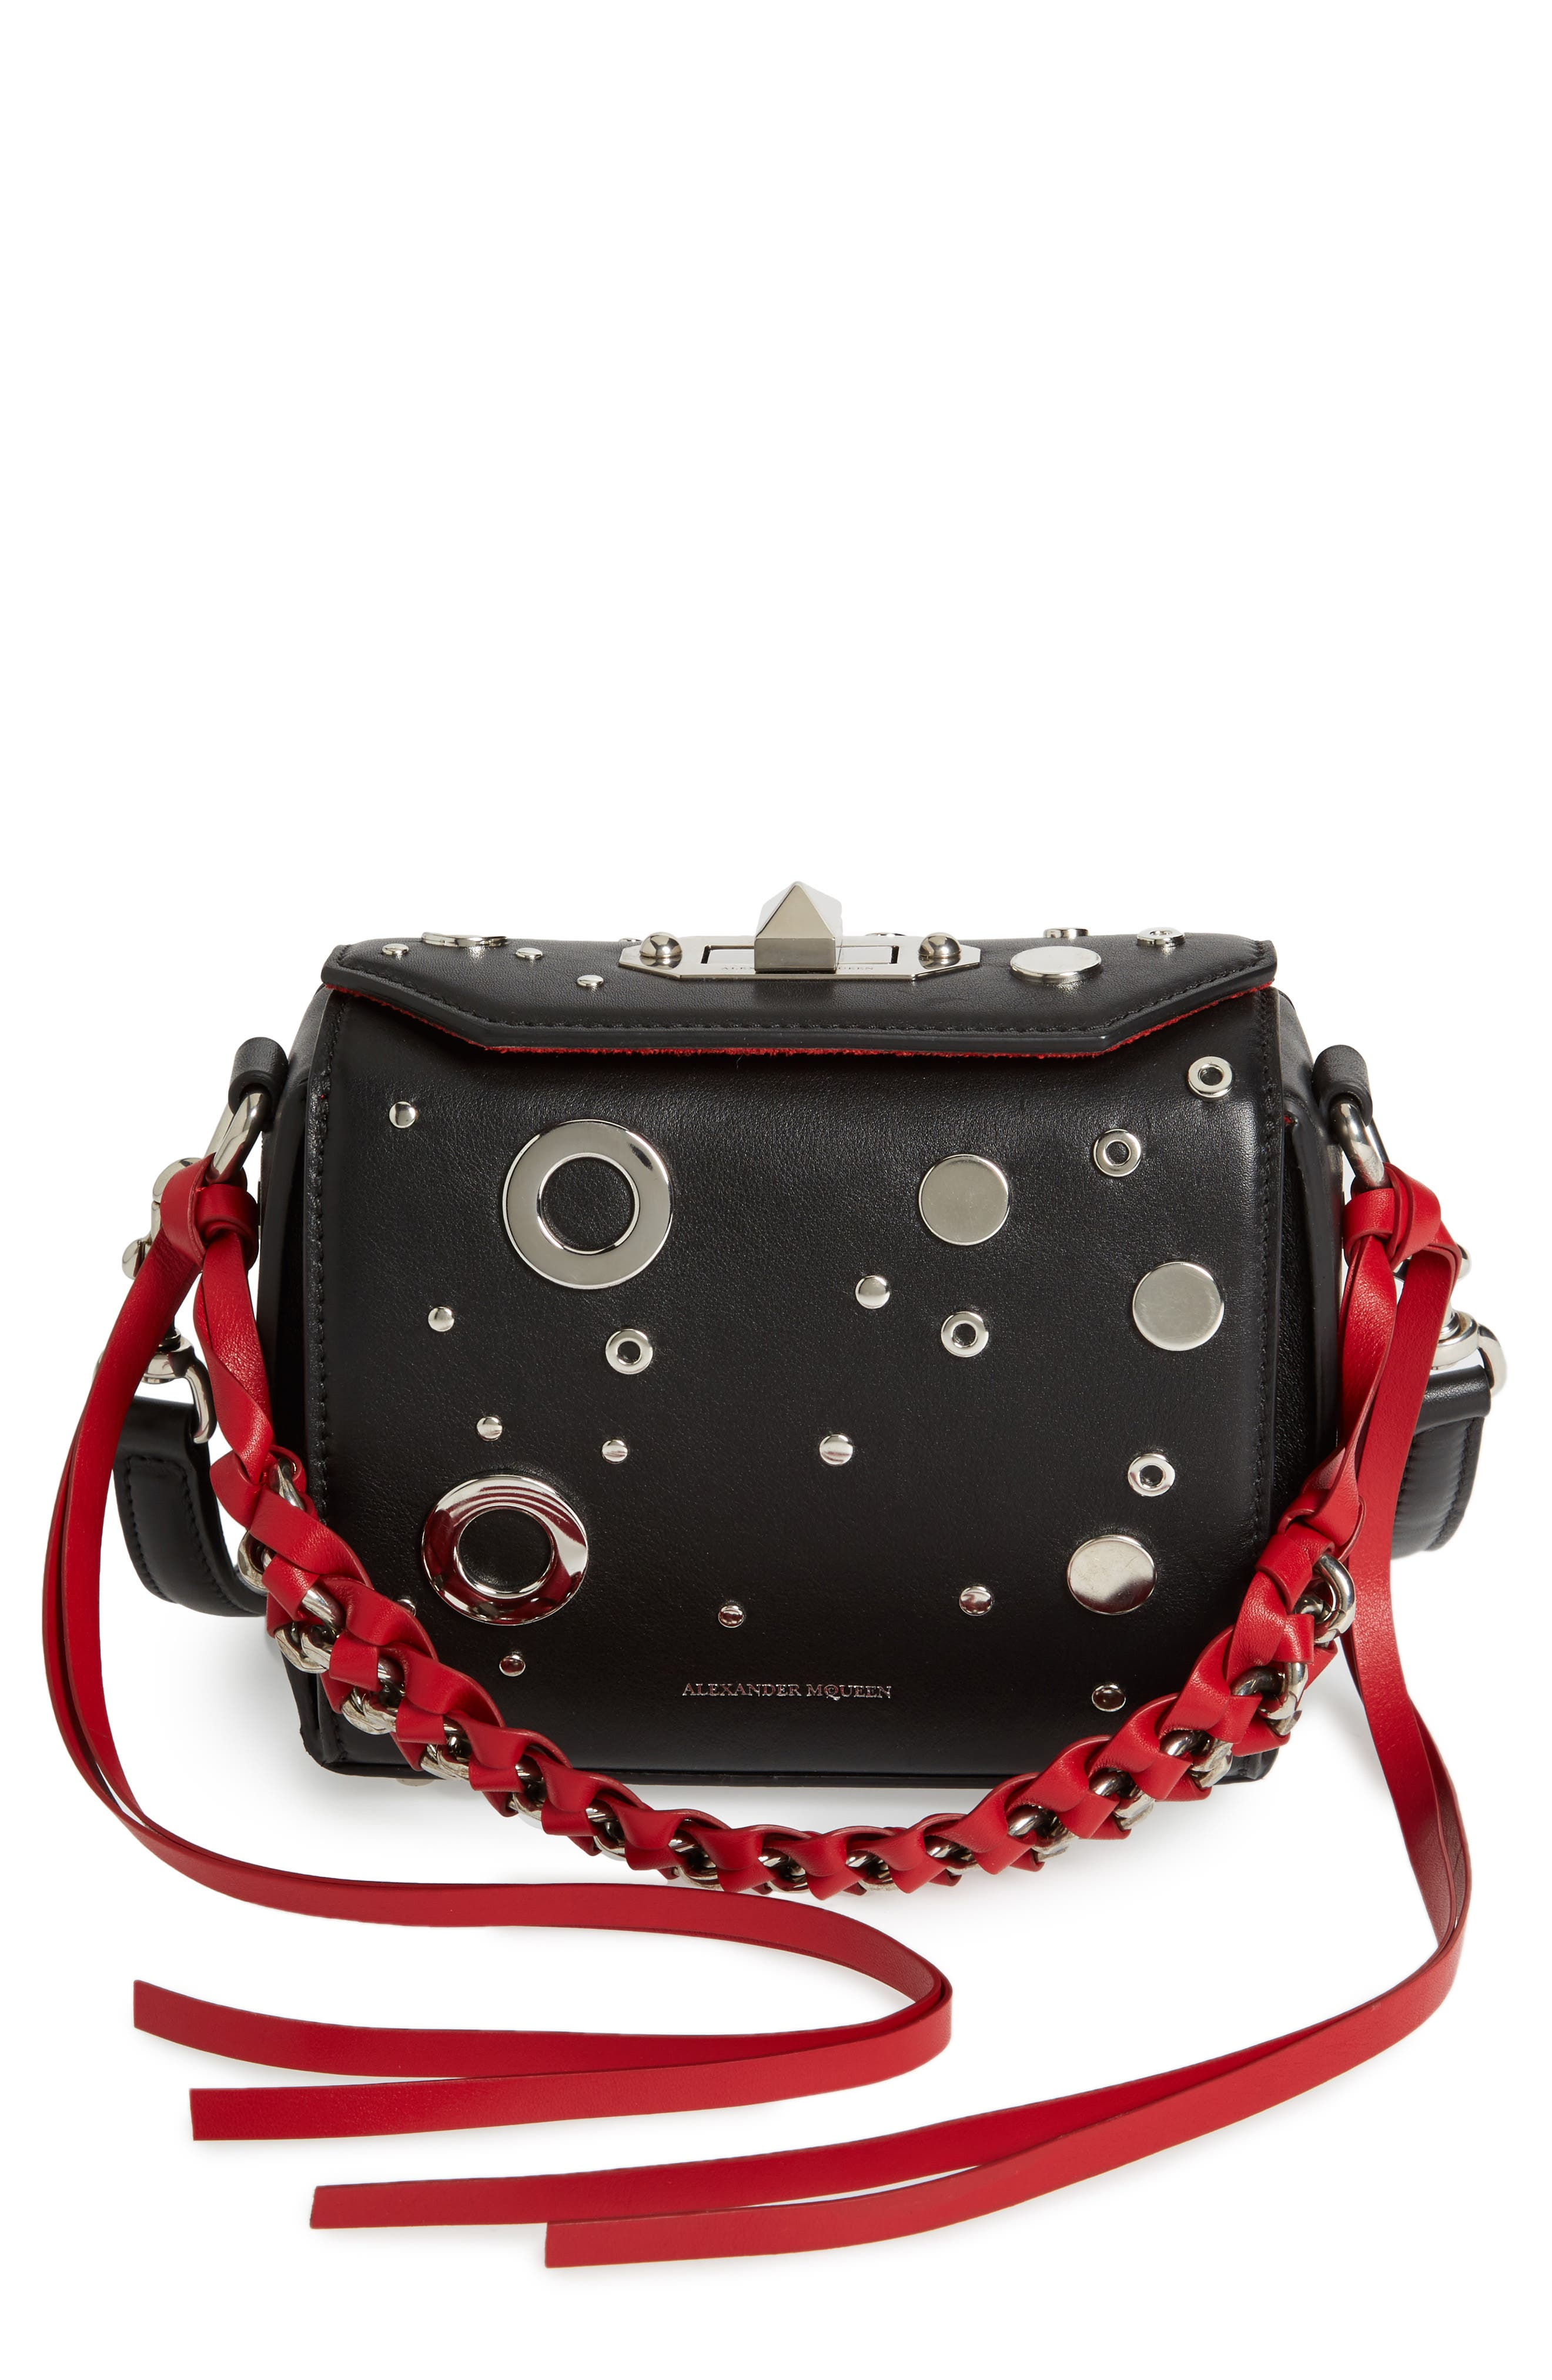 Box Bag 16 Matte Calfskin Bag,                         Main,                         color, Black/ Red